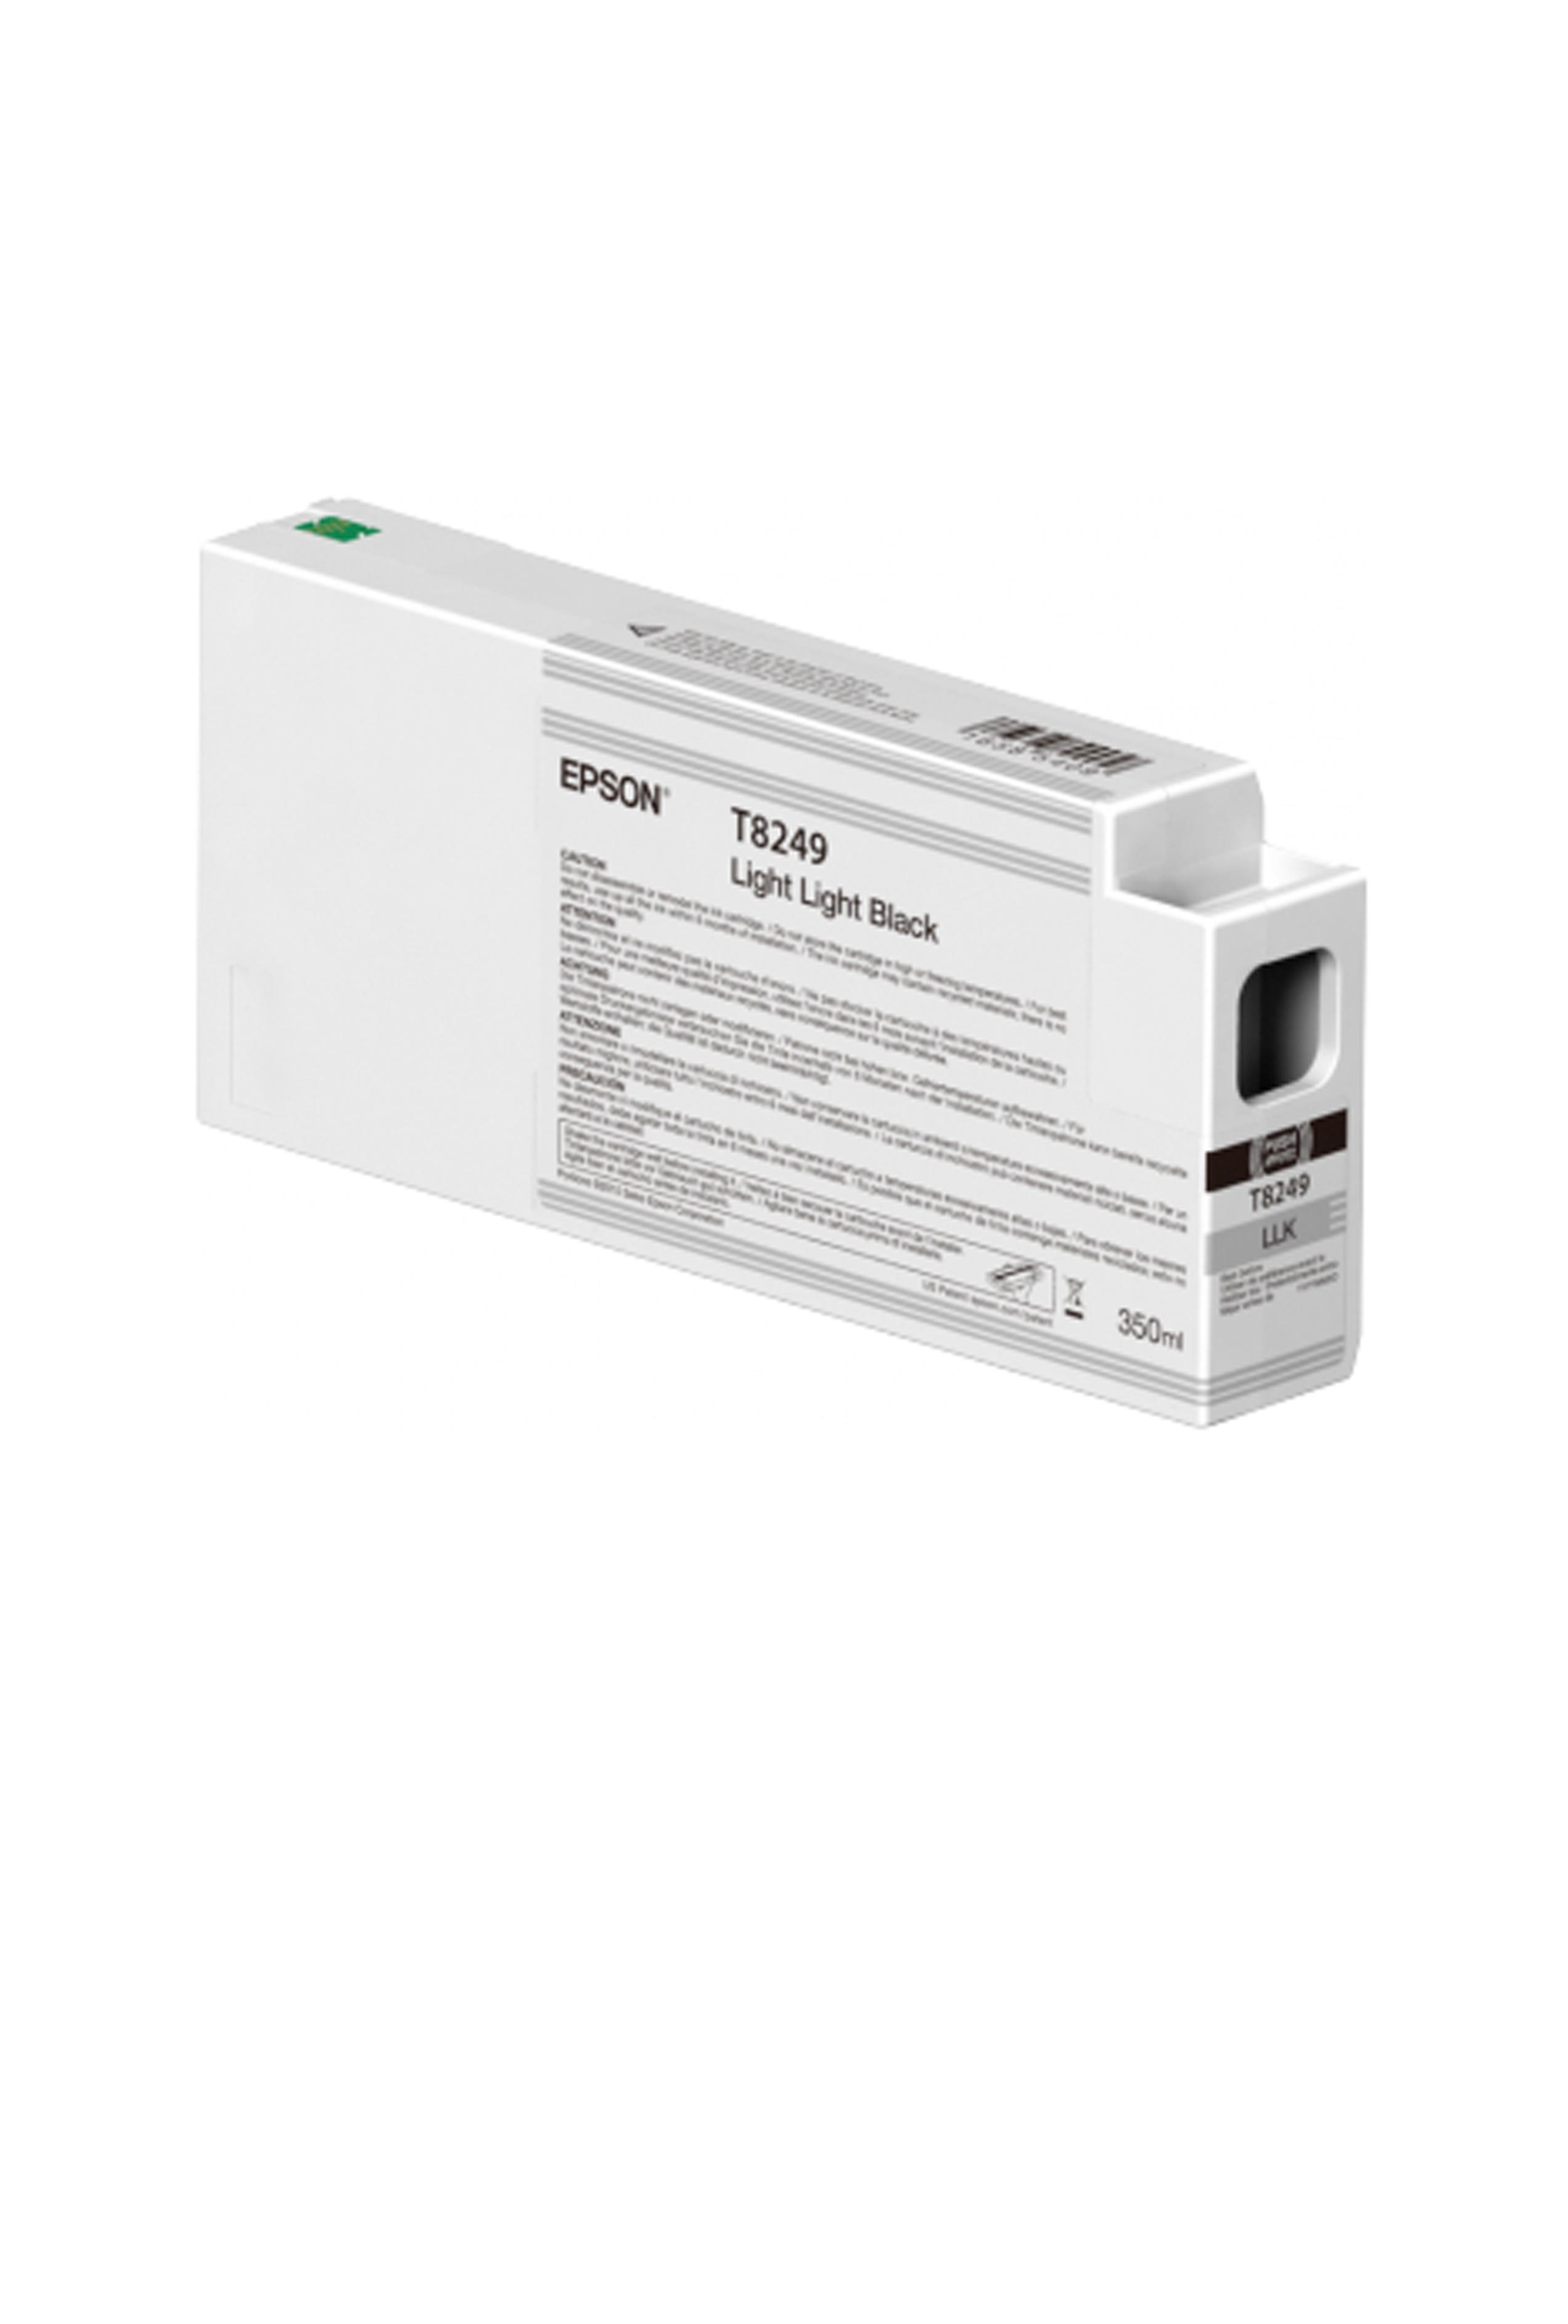 Epson EPSON HI LT BLACK INK (350 ML) (T824700)